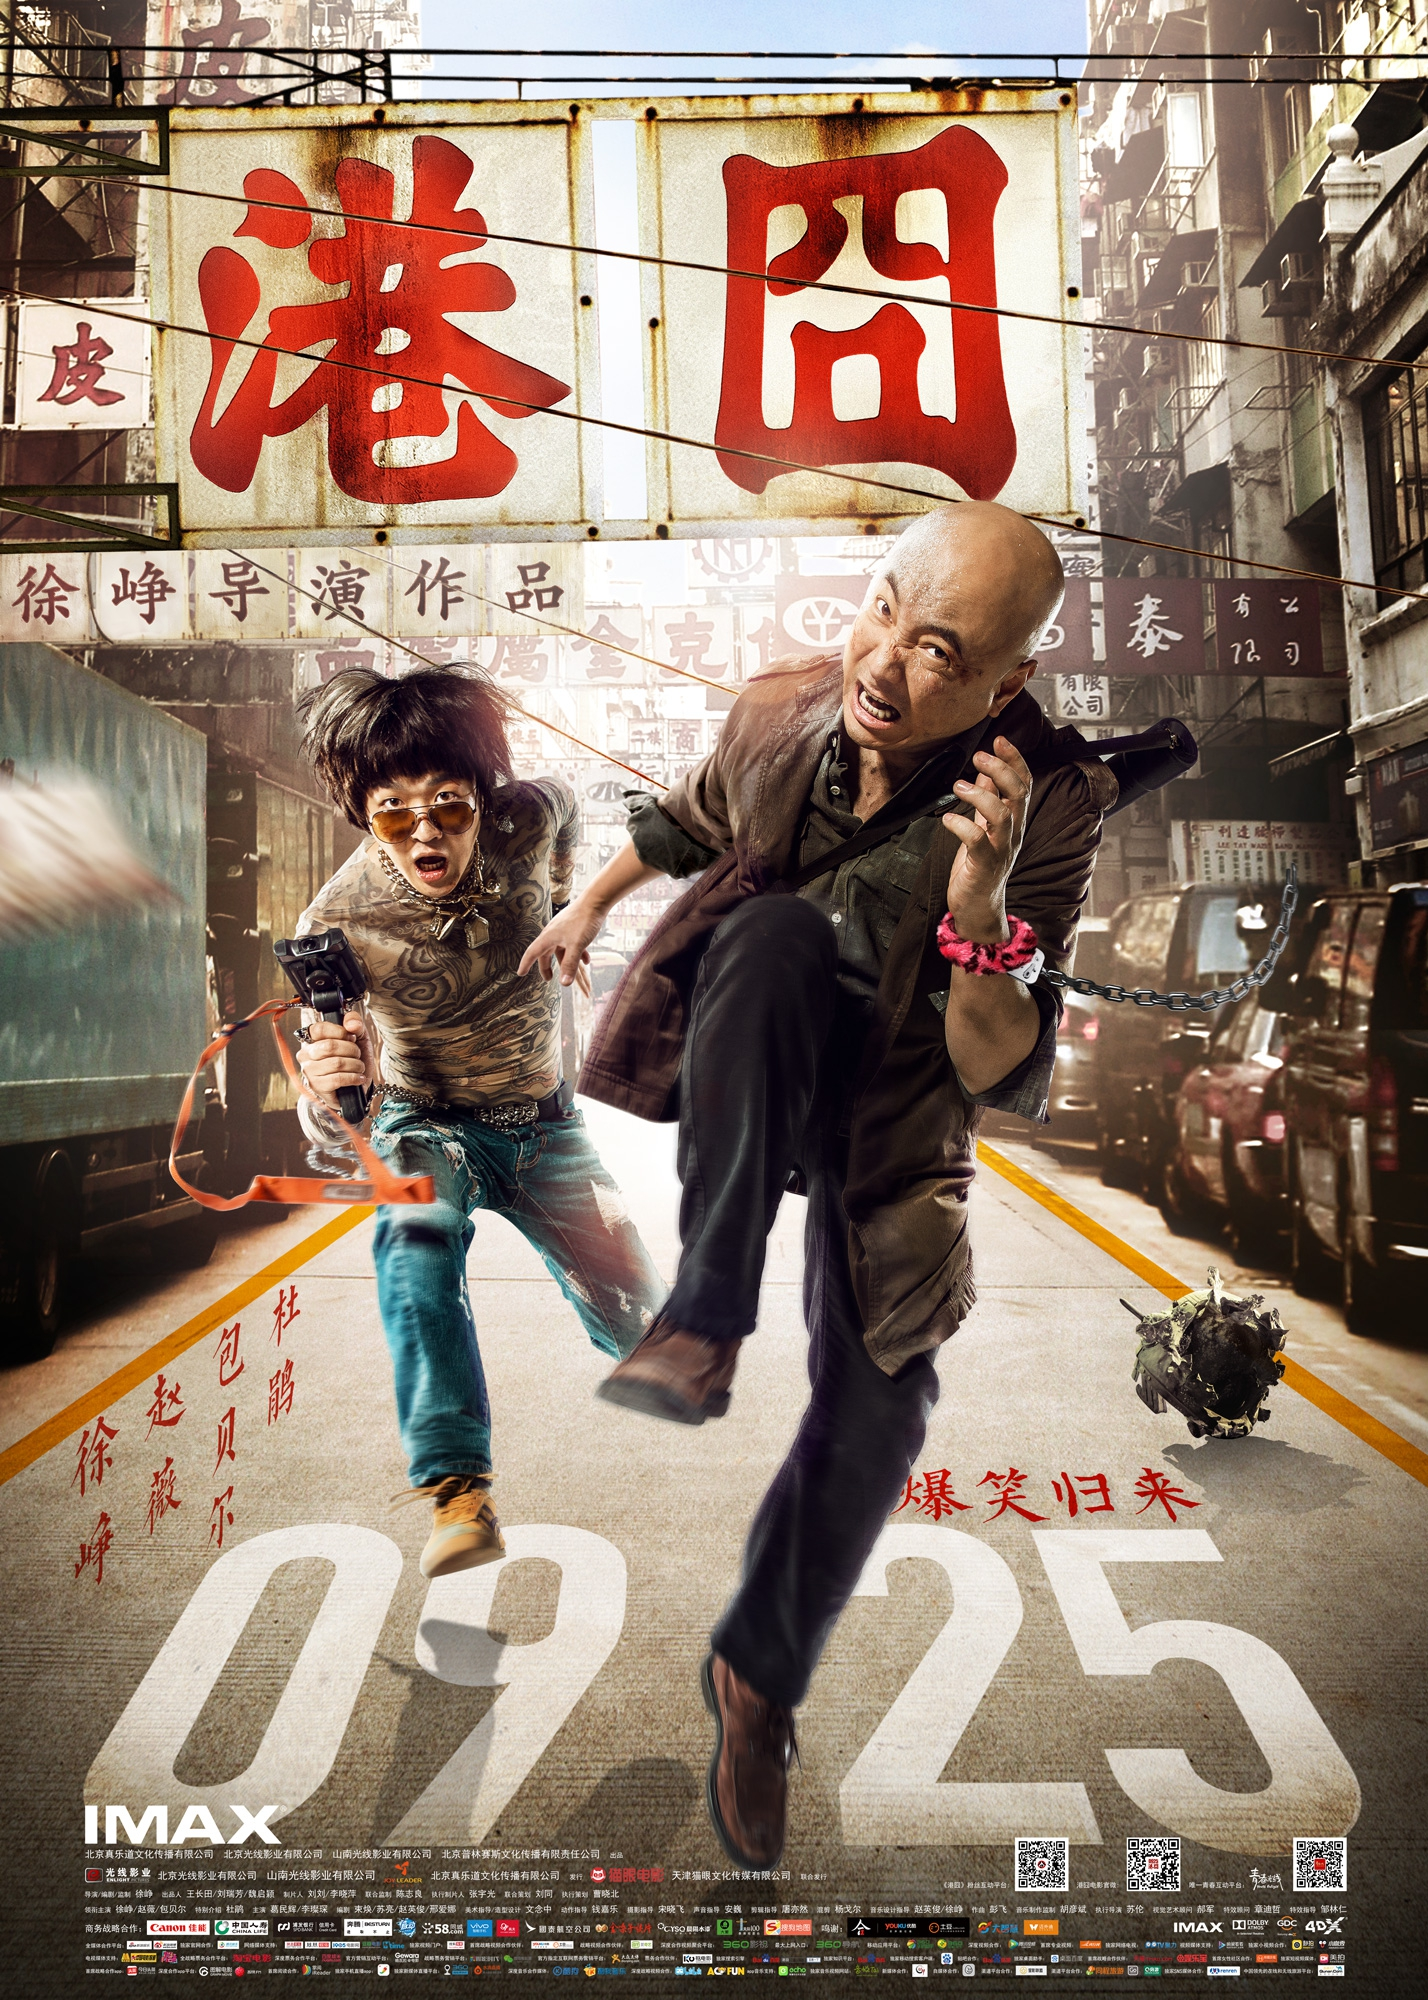 Lost in Hong Kong (2015)